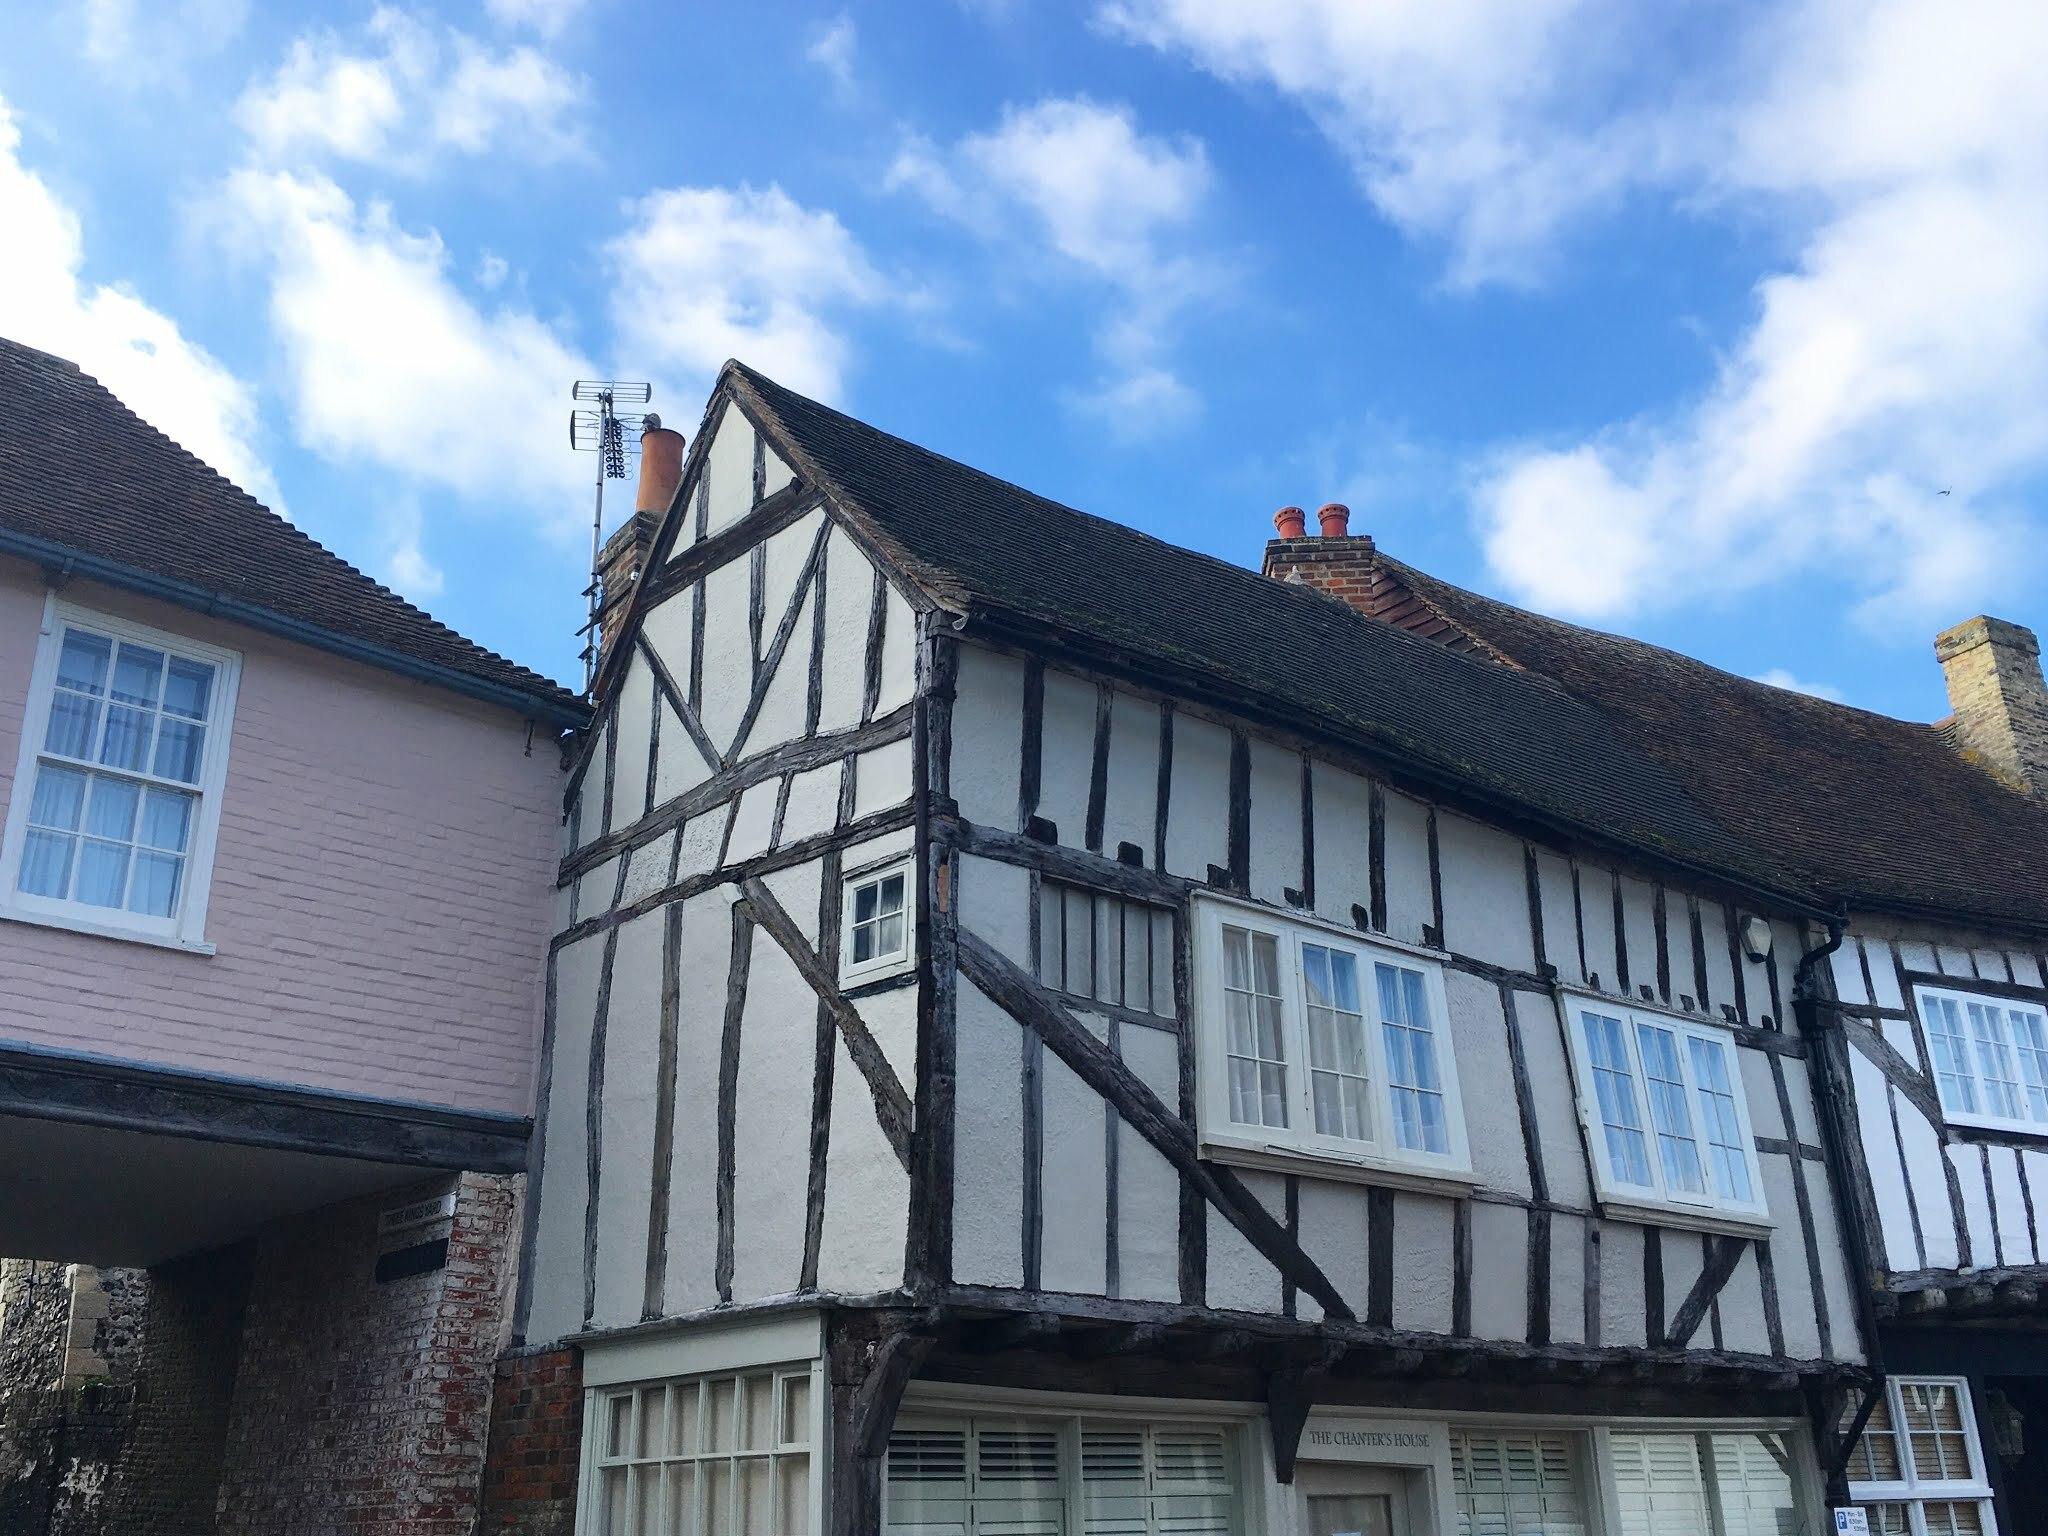 Cottages in Sandwich, Kent